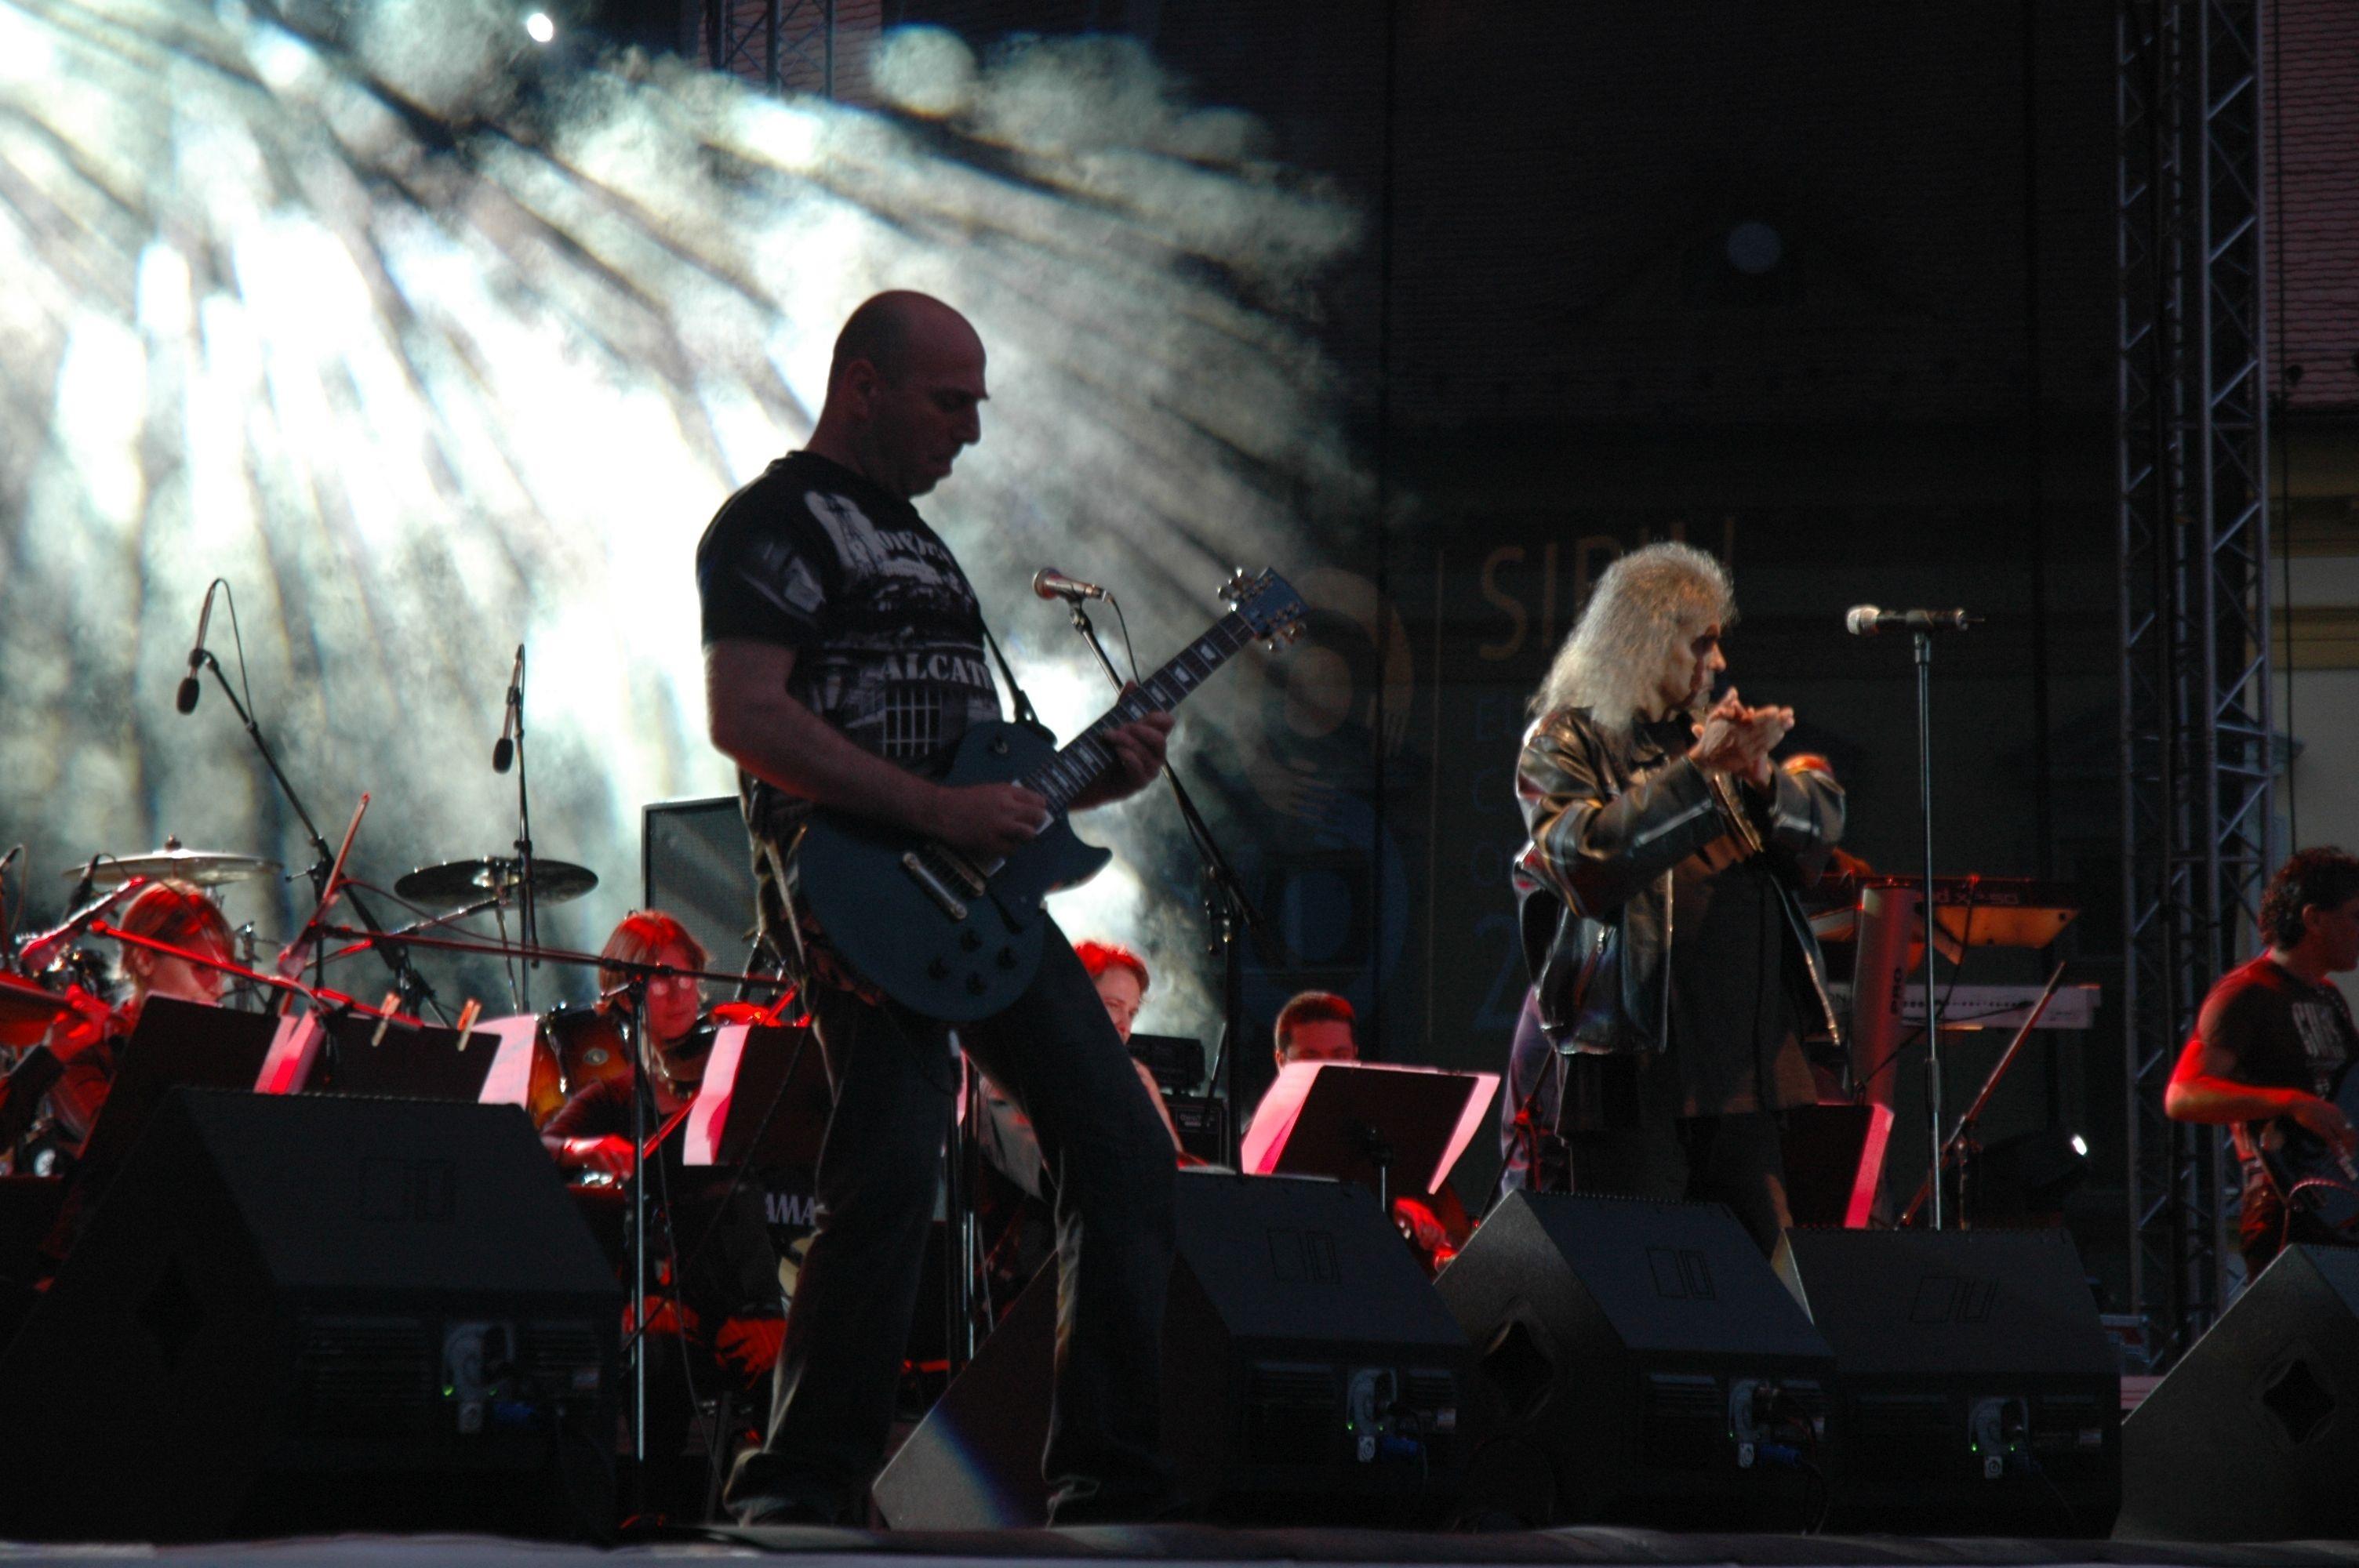 free images rock silhouette music play guitar smoke